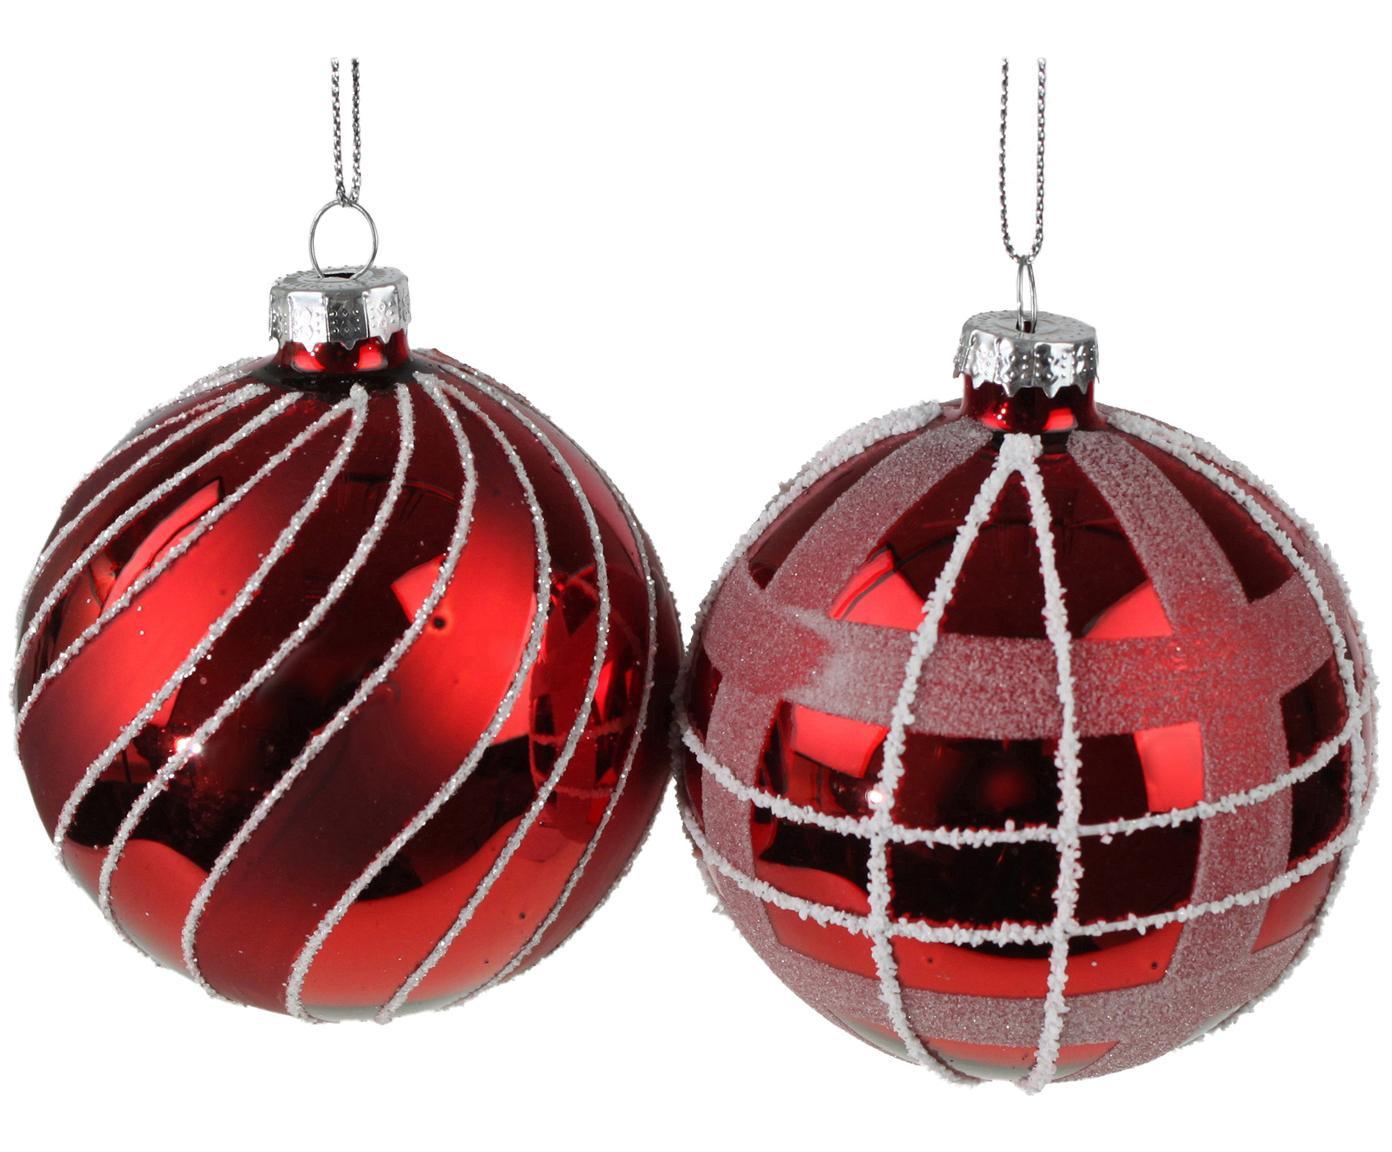 Weihnachtskugel-Set Designs Ø8cm, 4-tlg., Glas, lackiert, Rot, Ø 8 cm